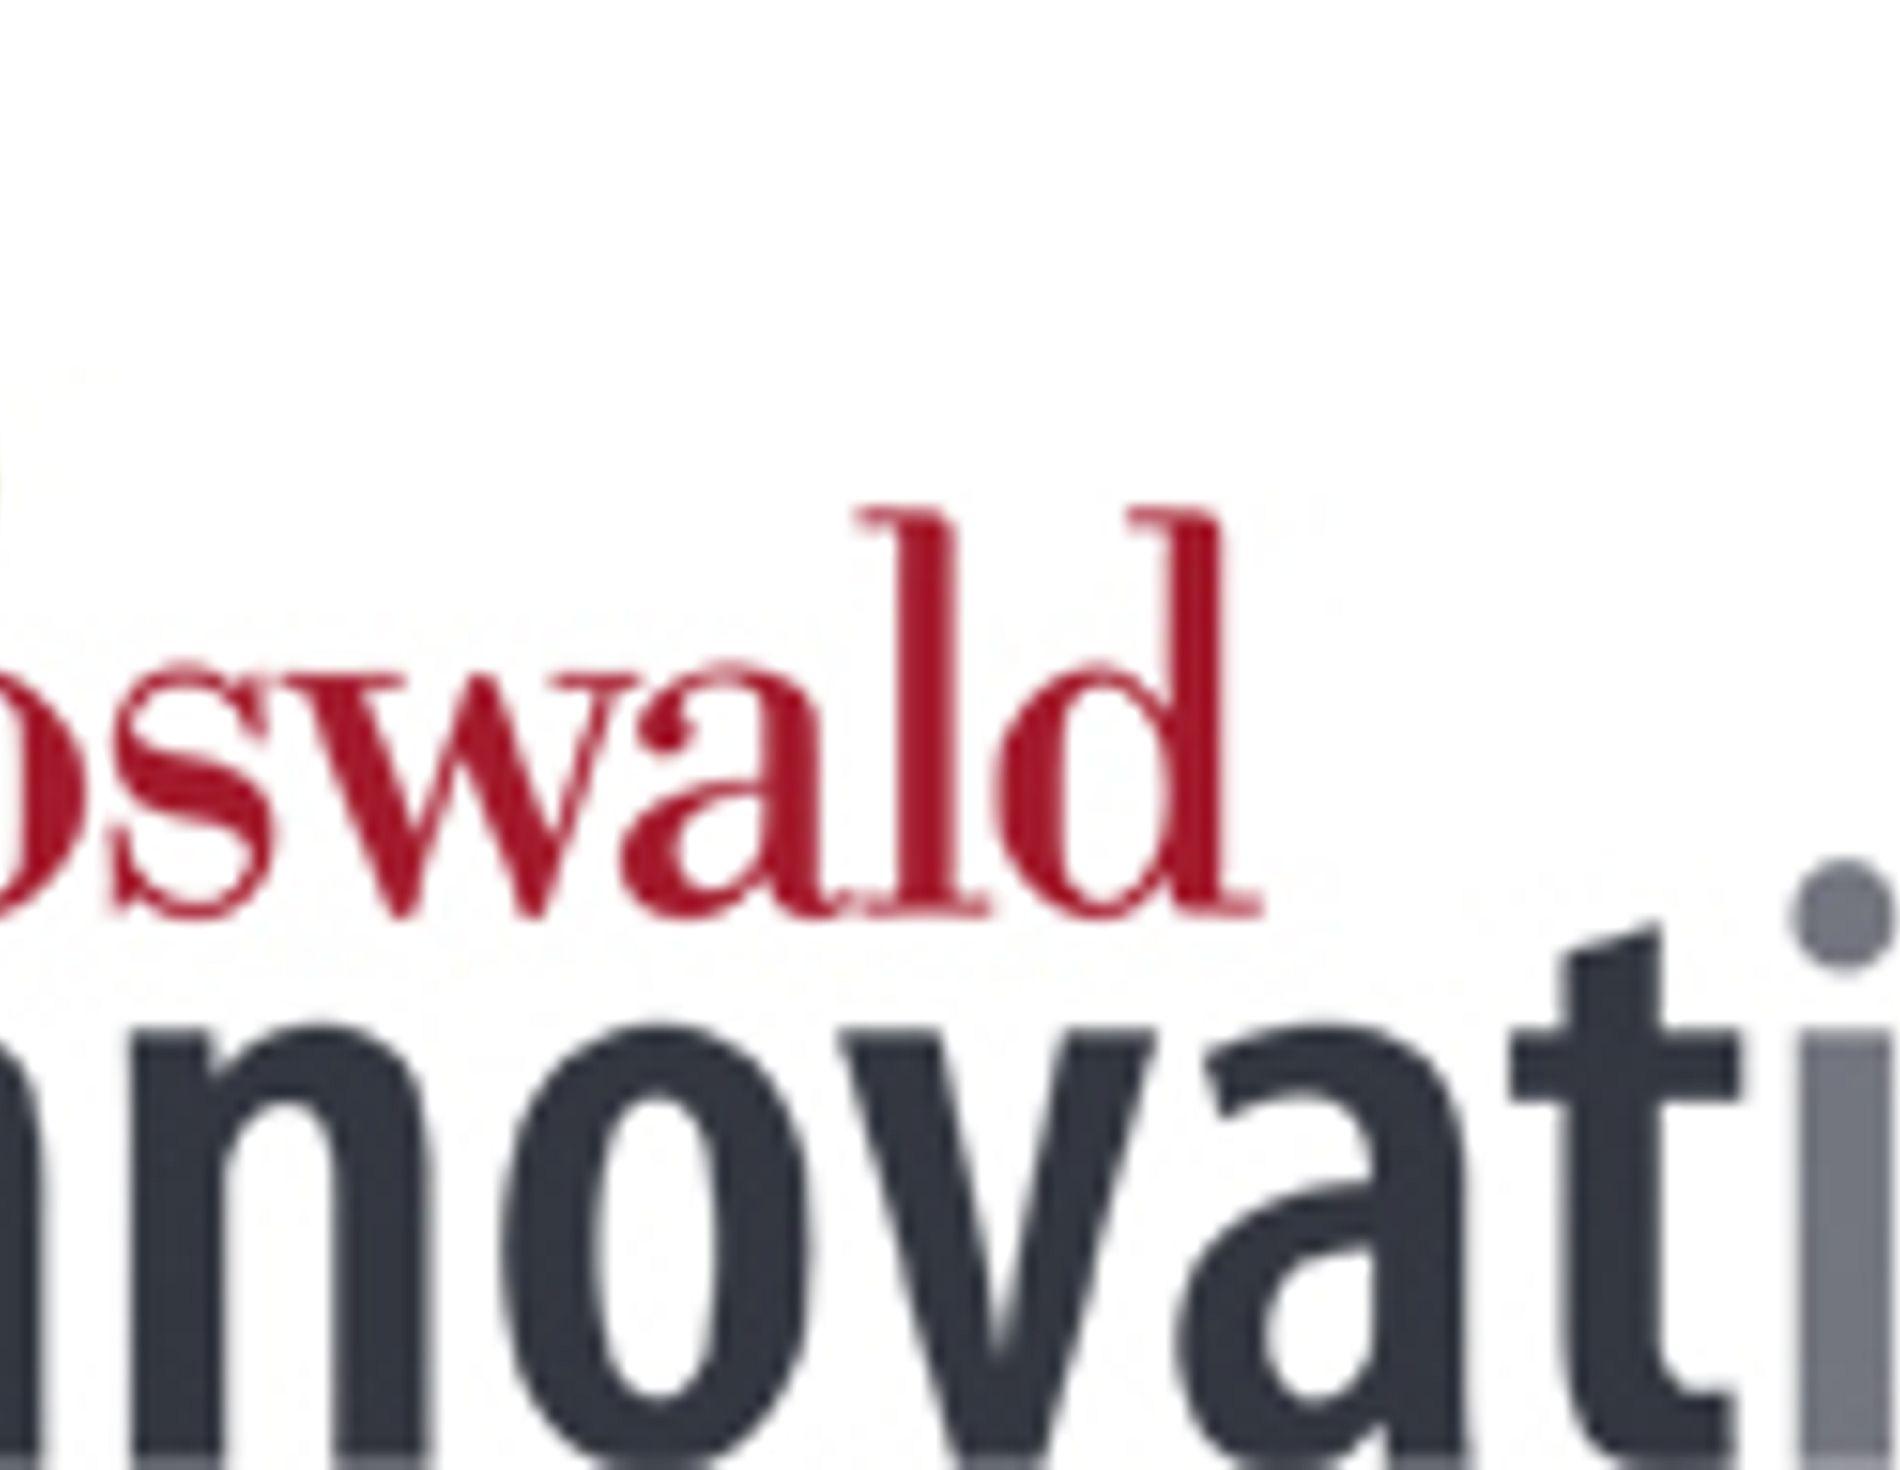 oswald innovation logo